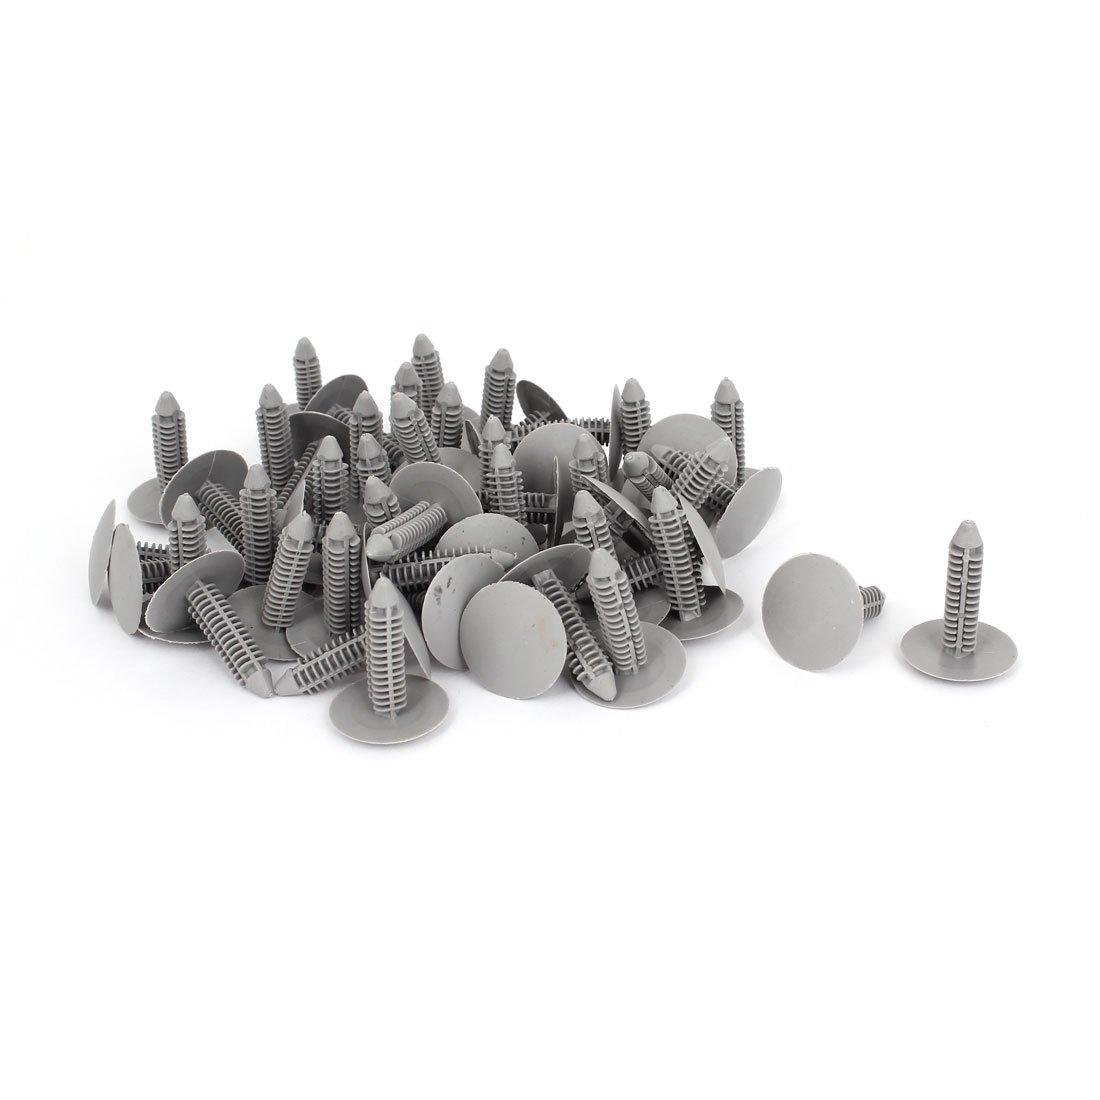 20 Pack uxcell a14102400ux0641 Car Auto Parts Plastic Push Screw Rivet Panel Fixings Clips Gray 20Pcs